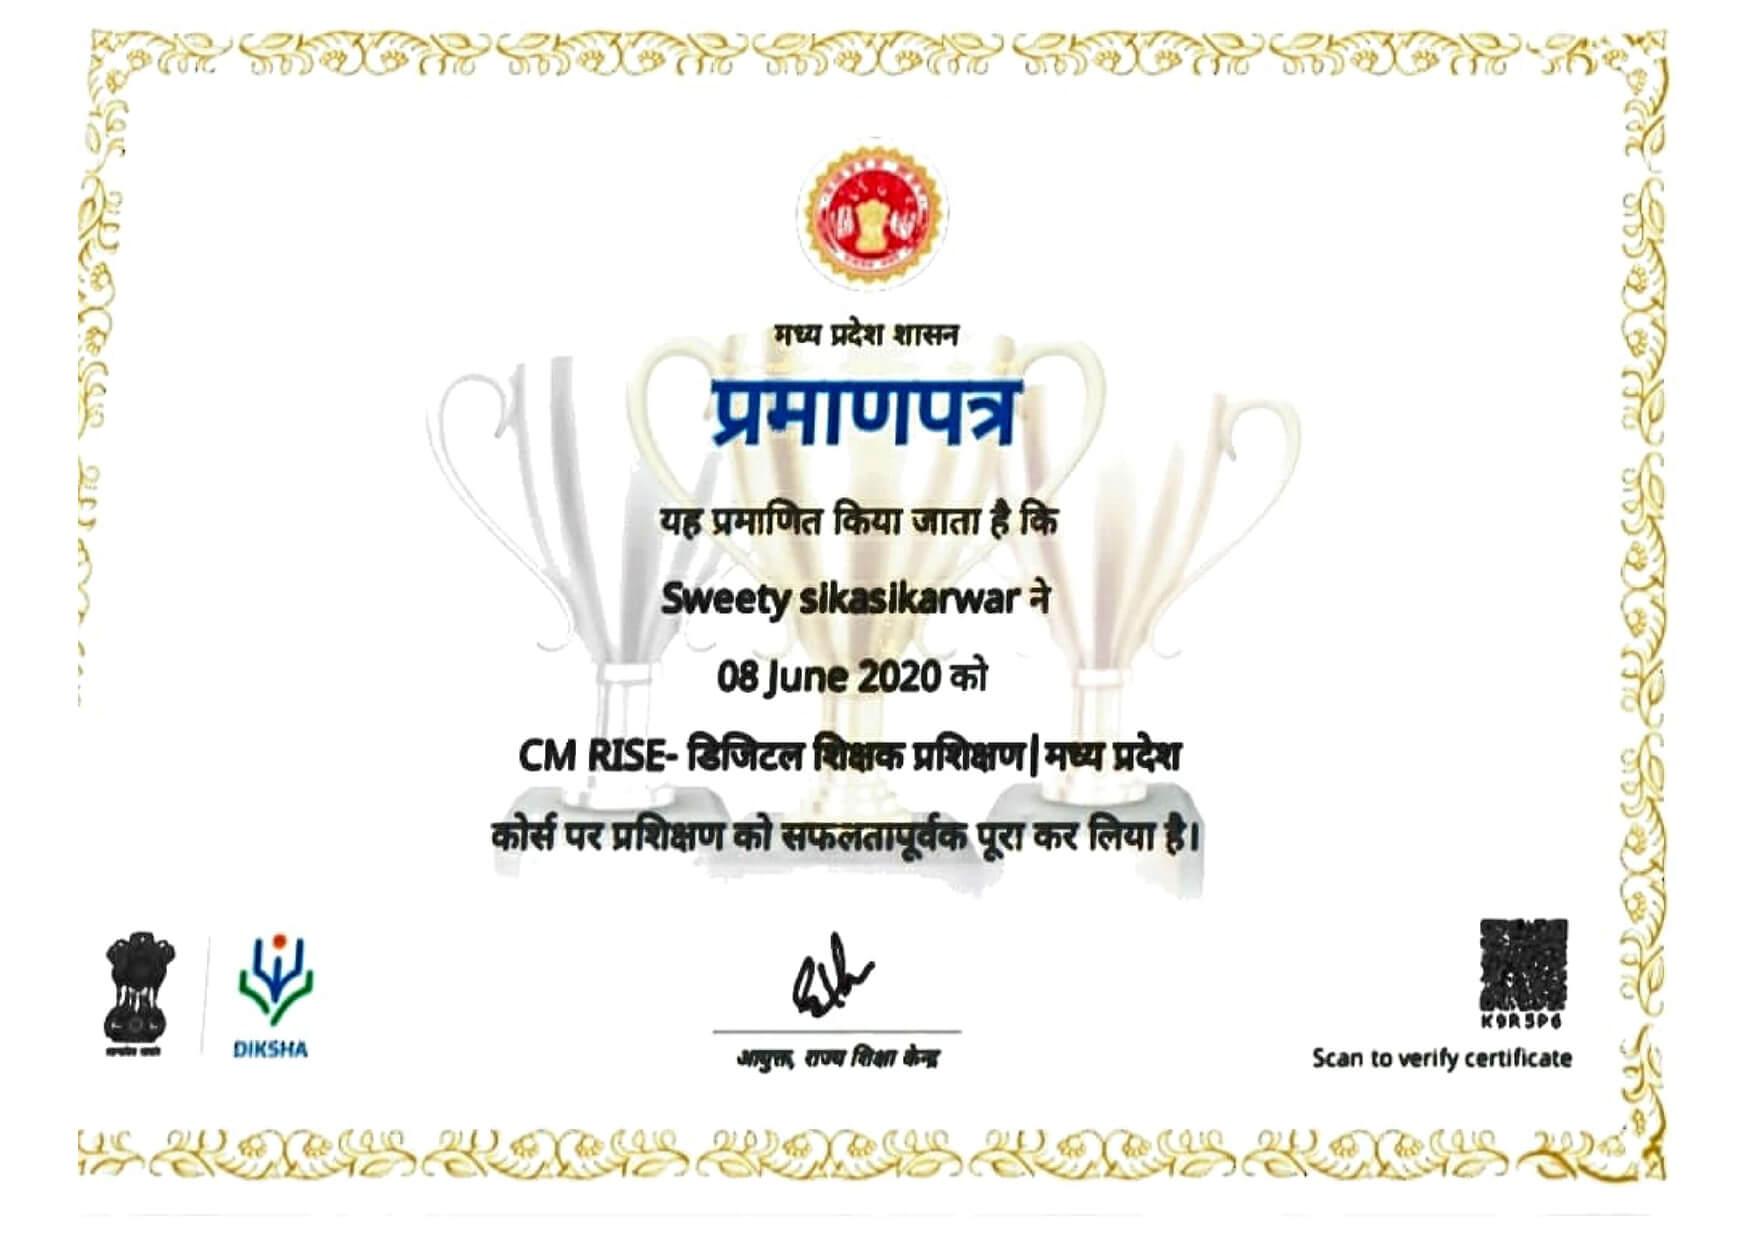 Ms. Sweety Sikarwar